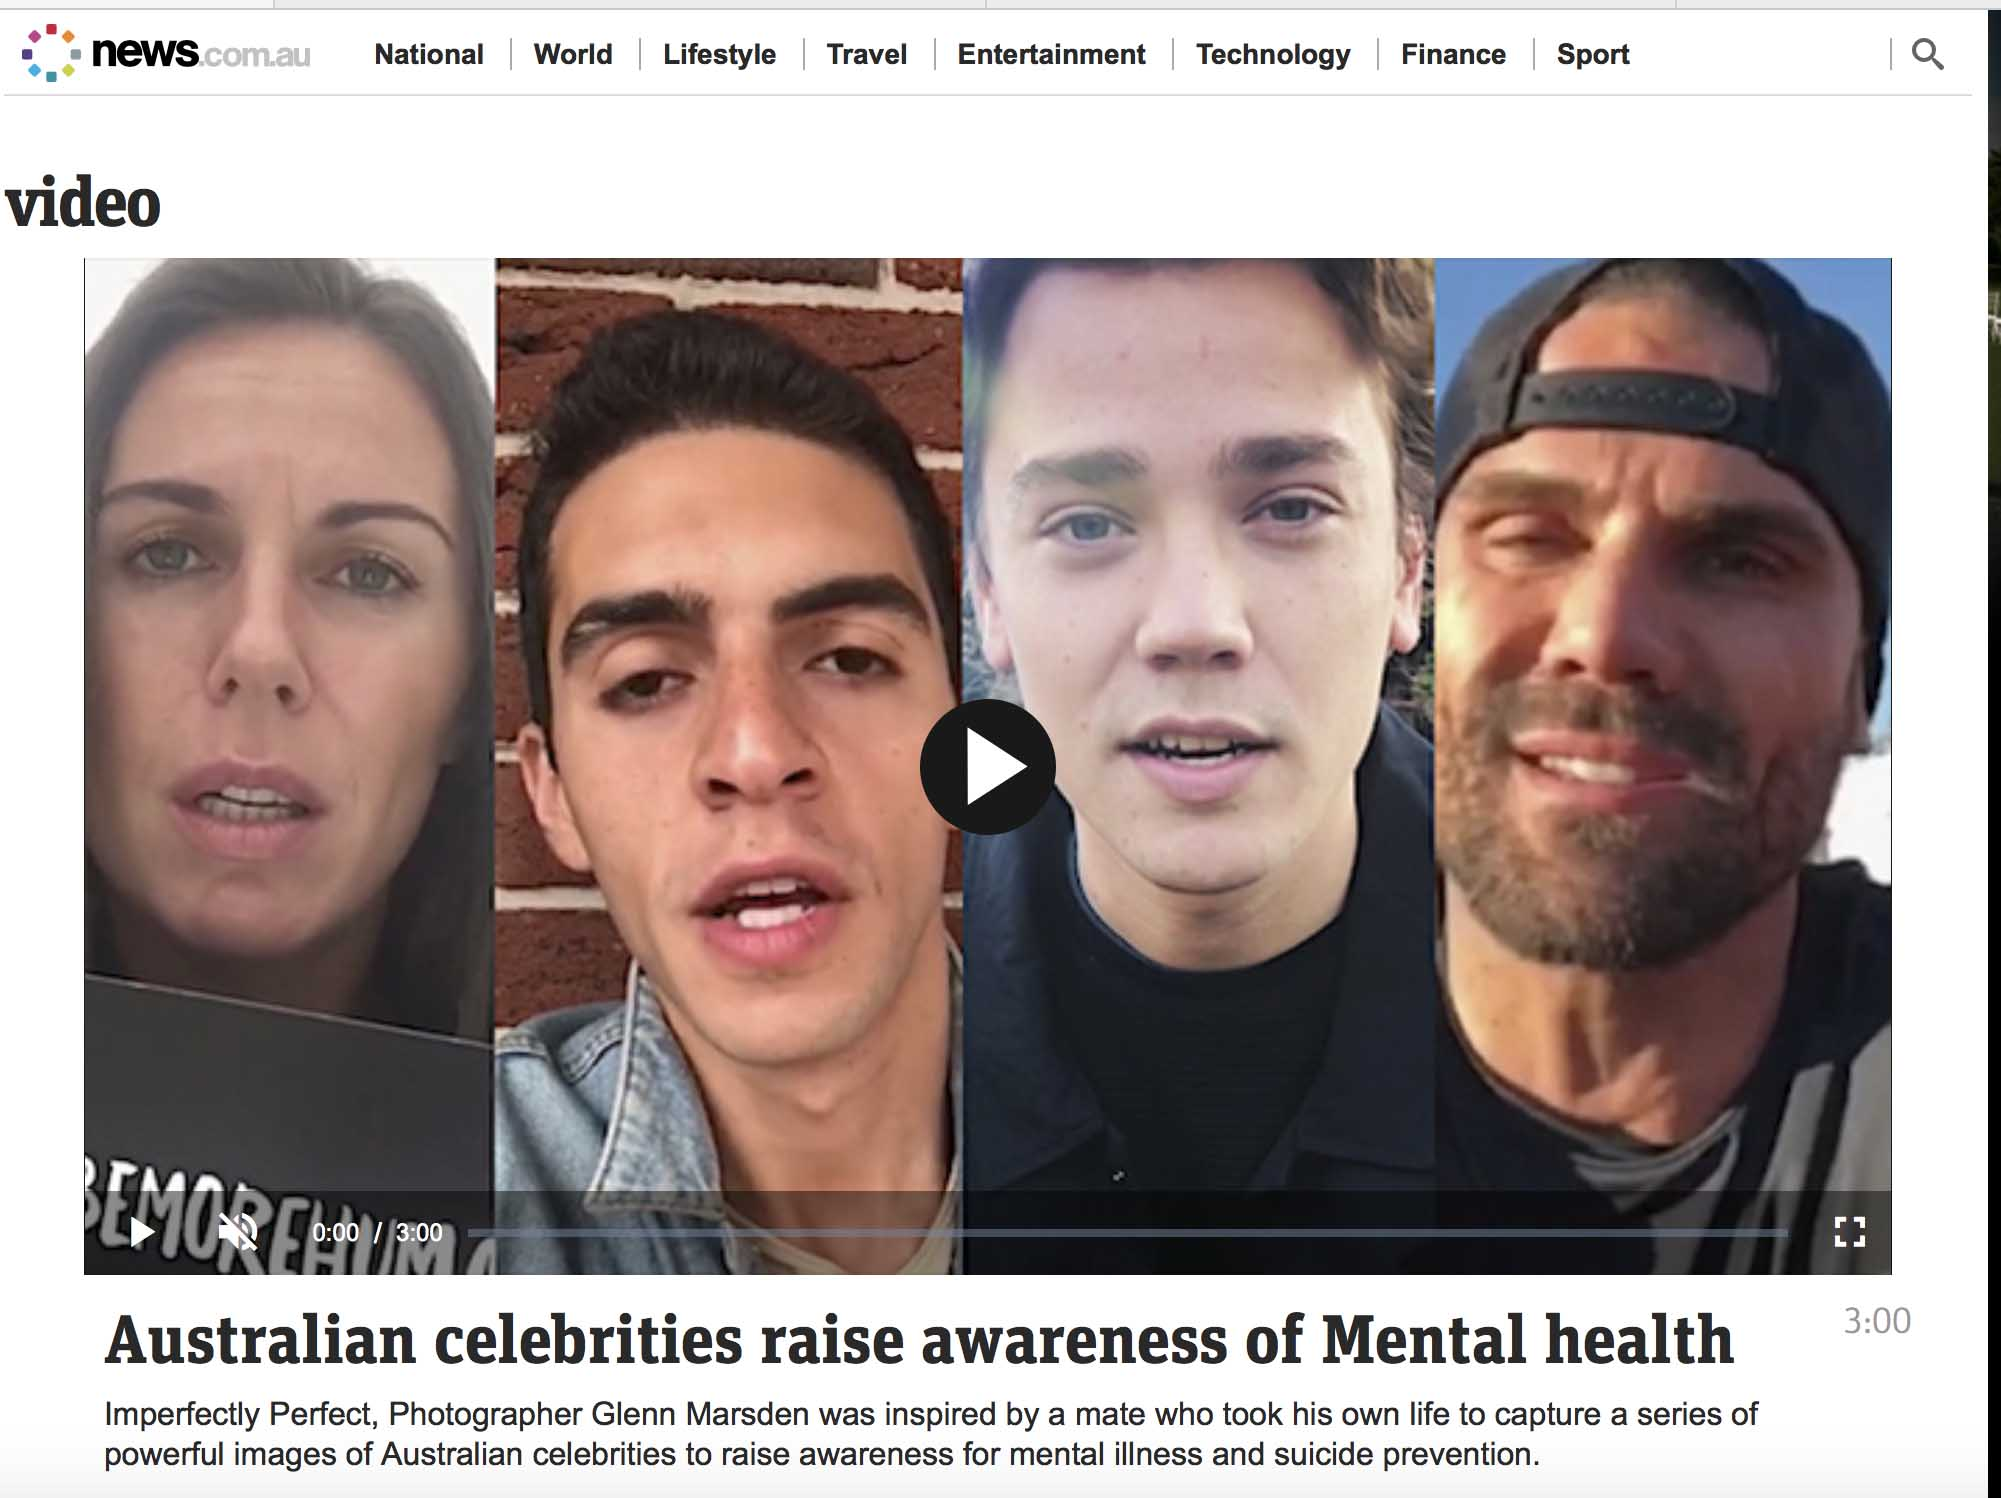 News.com.au - Australian Celebrities raise awareness of Mental health